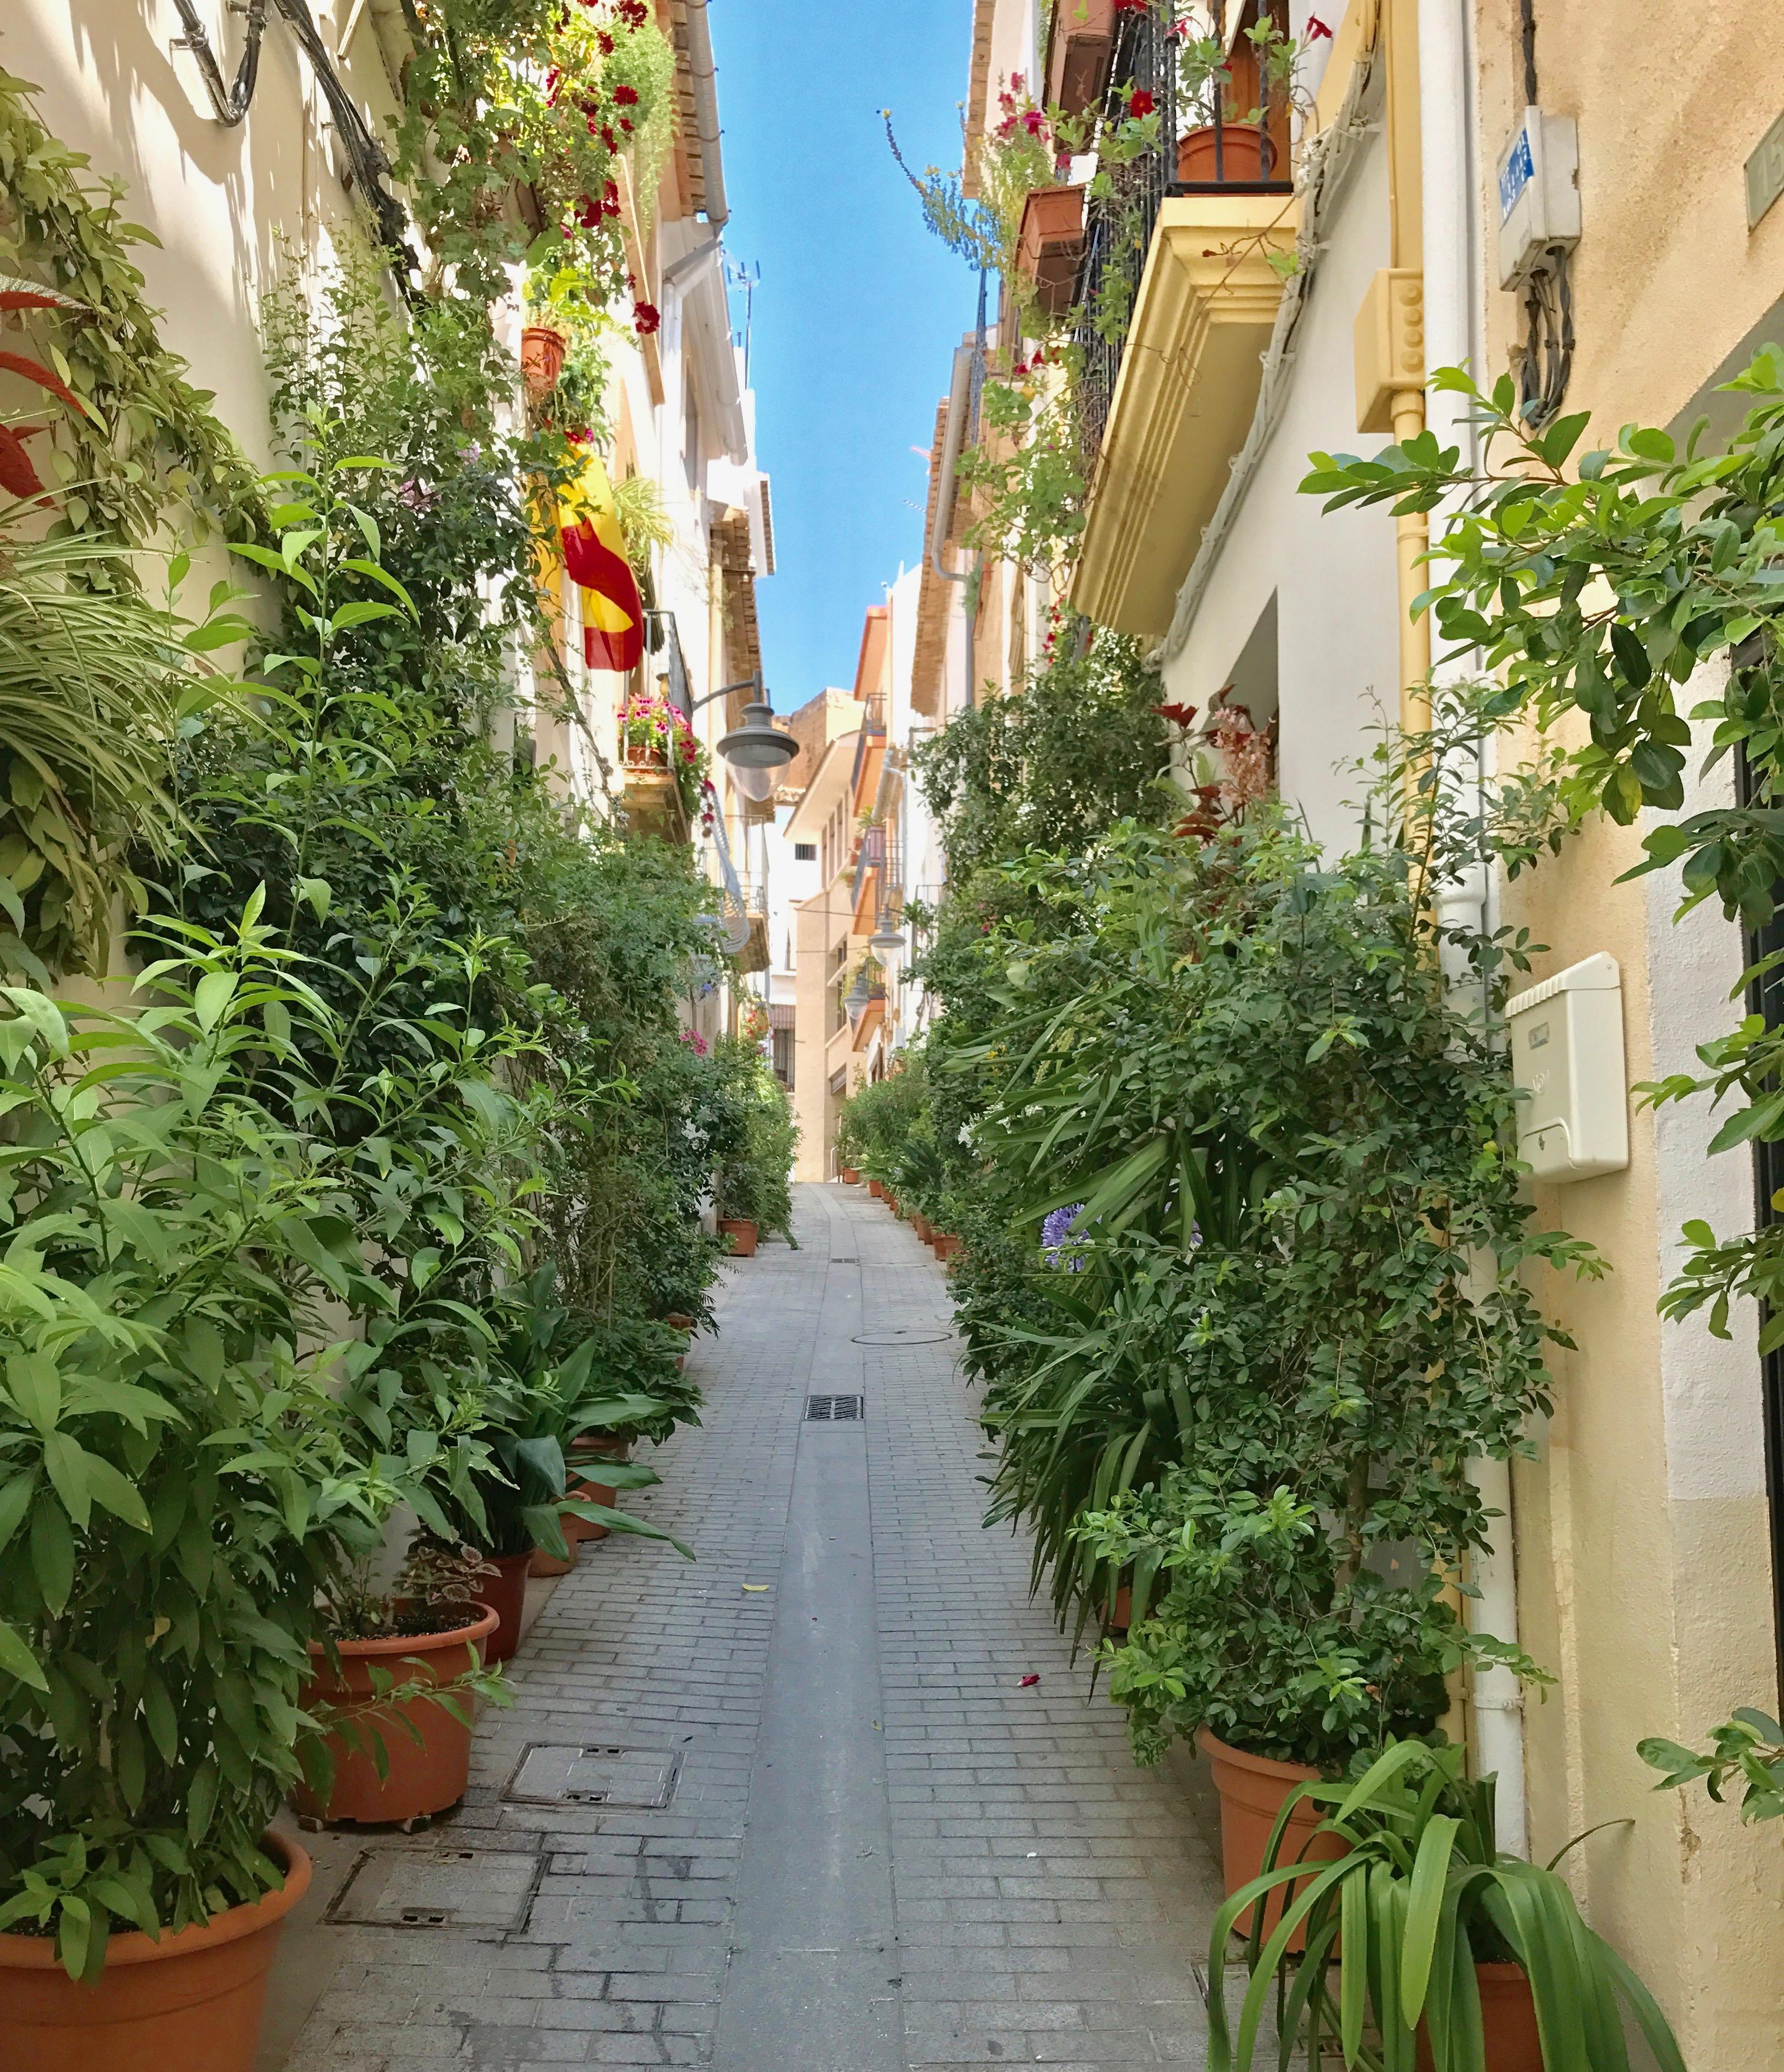 Lavea old ton streets